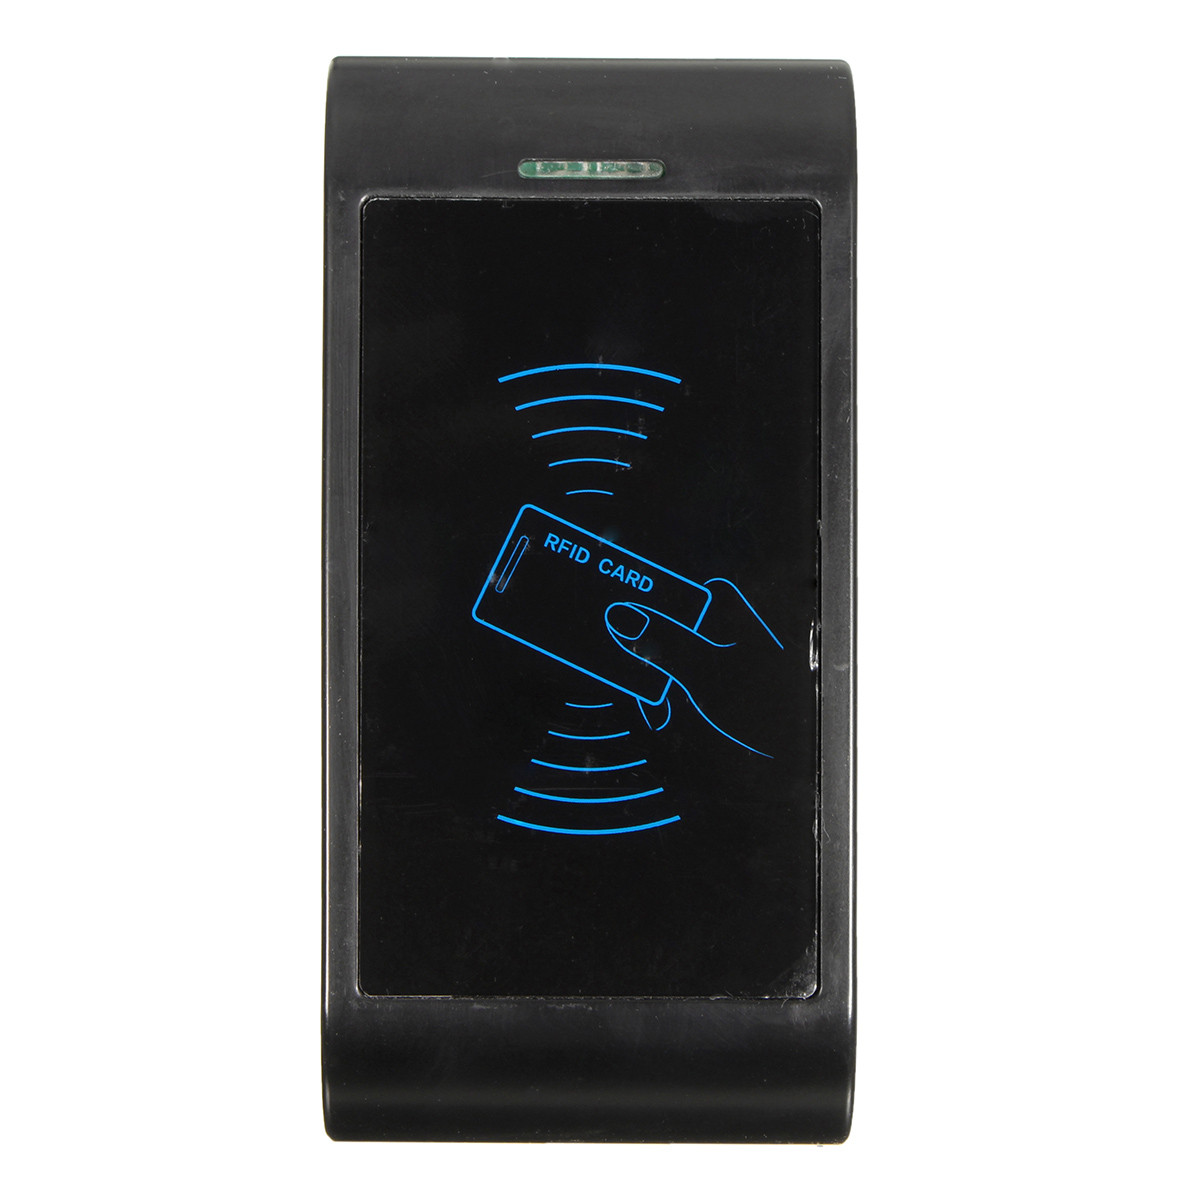 все цены на  NEW RFID Security Entry Door Reader Card Keypad Mini ID Access Machine Controller Home Security Safety  онлайн